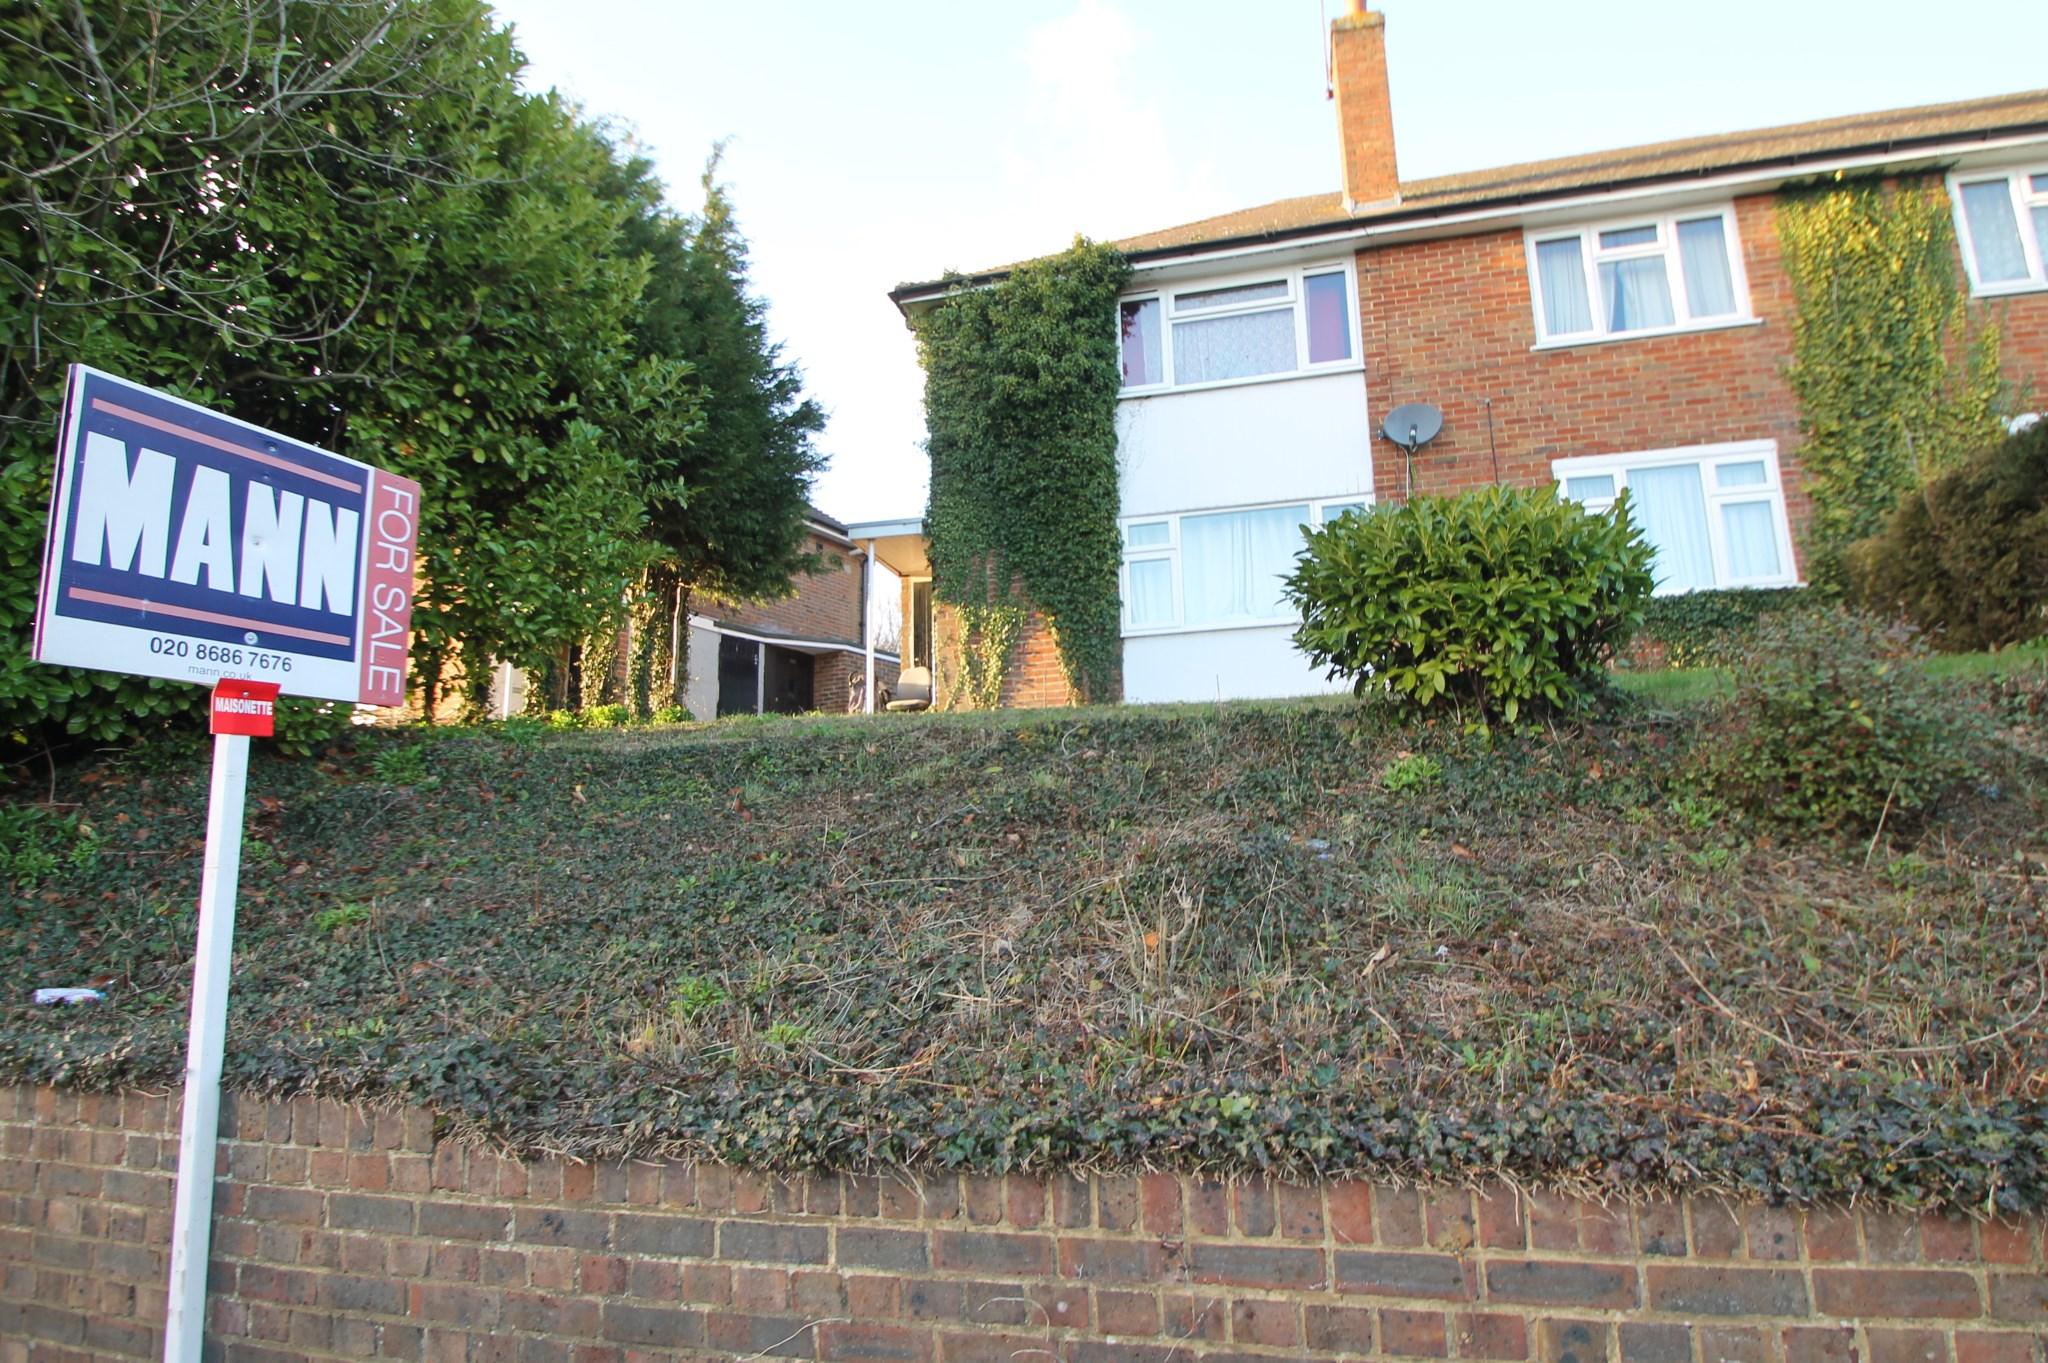 Kingsdown Avenue, South Croydon, Surrey, ., CR2